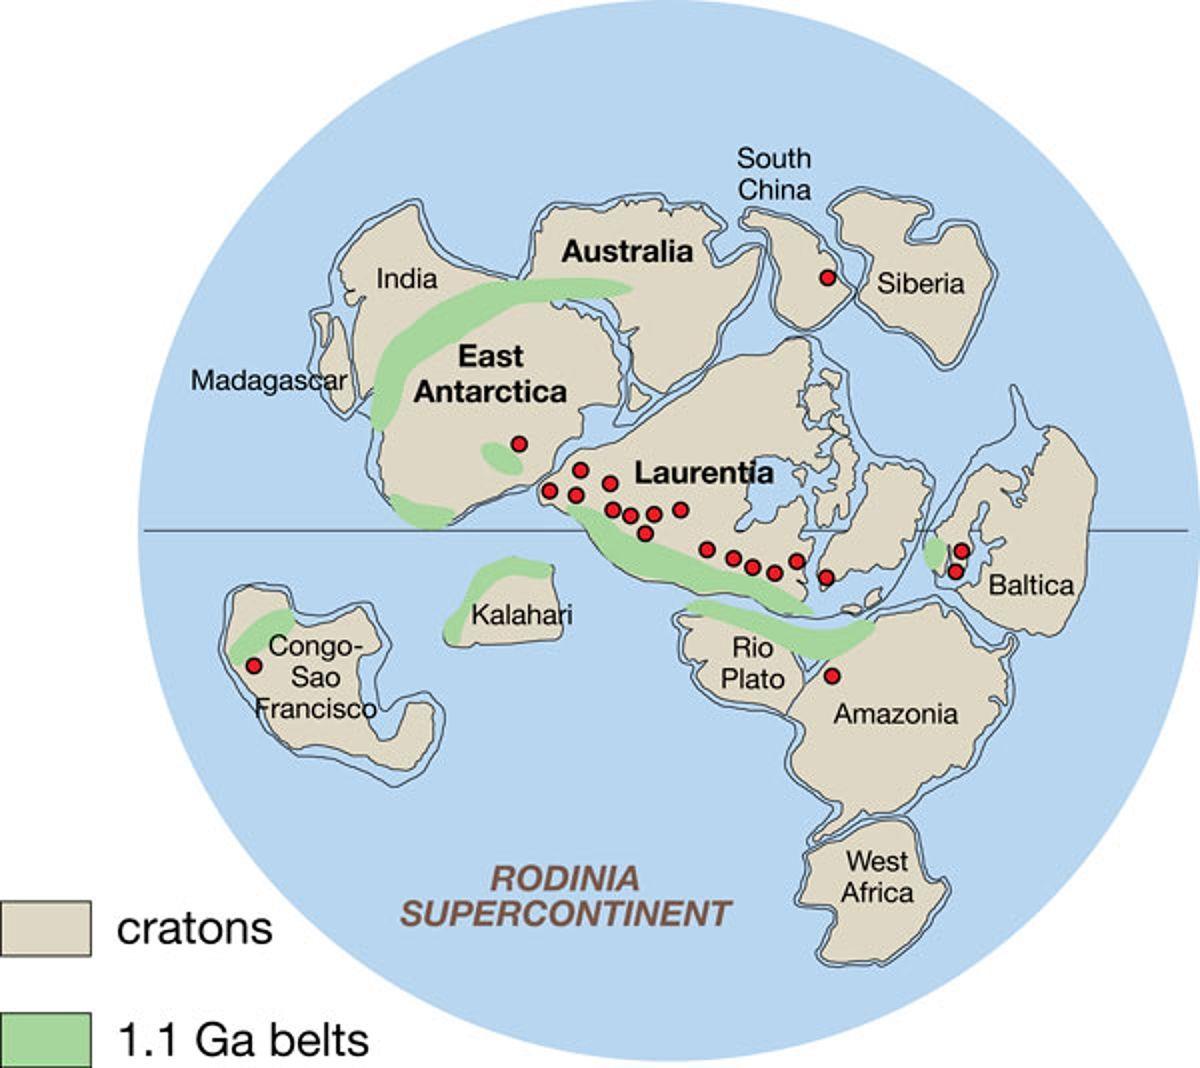 Rodinia_superkontinent